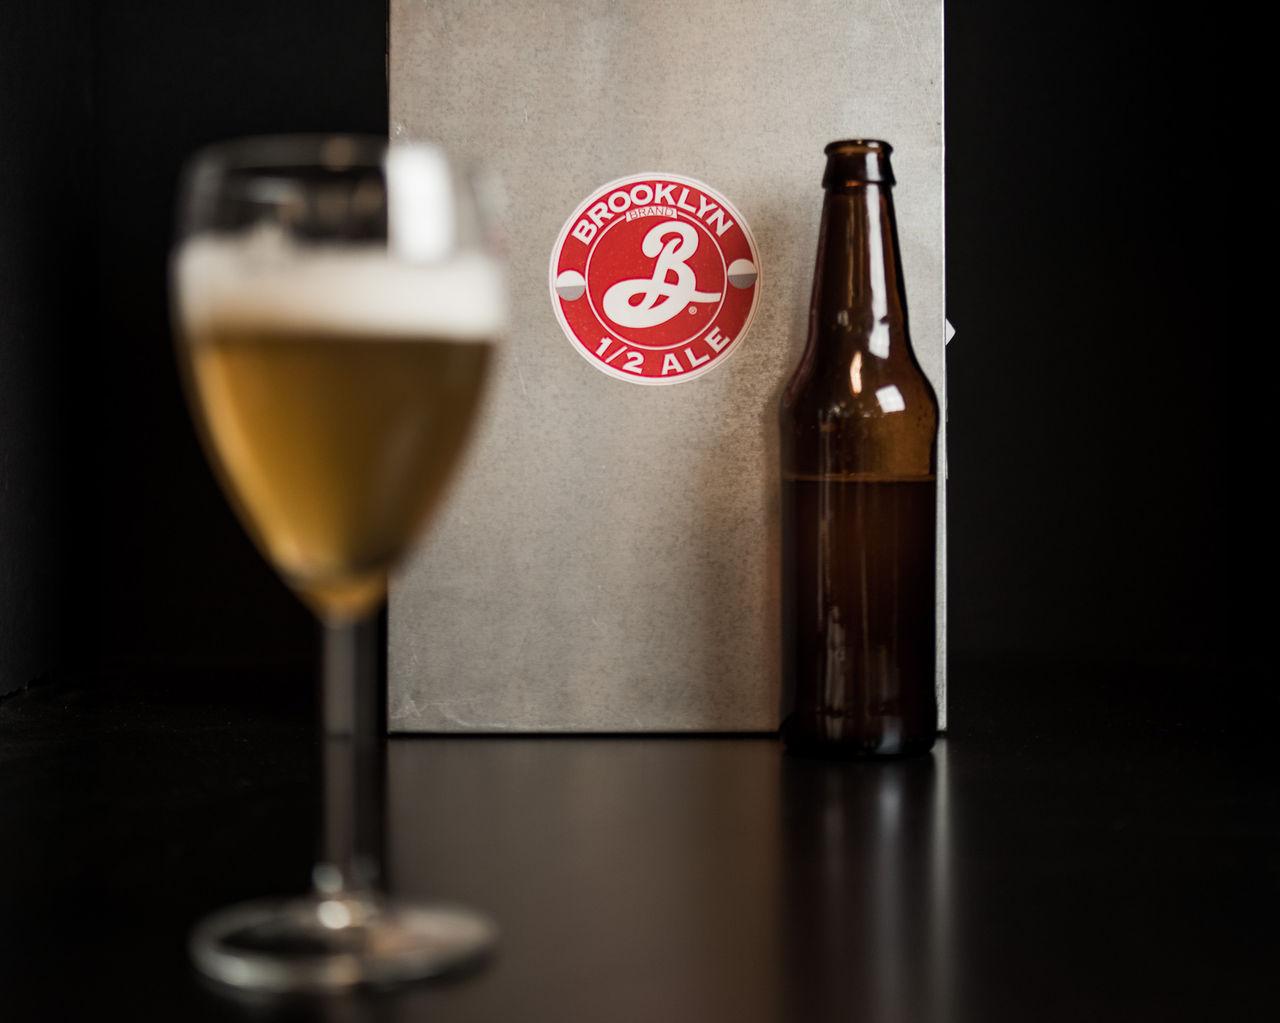 Vi har testat Brooklyn Brewerys folköl